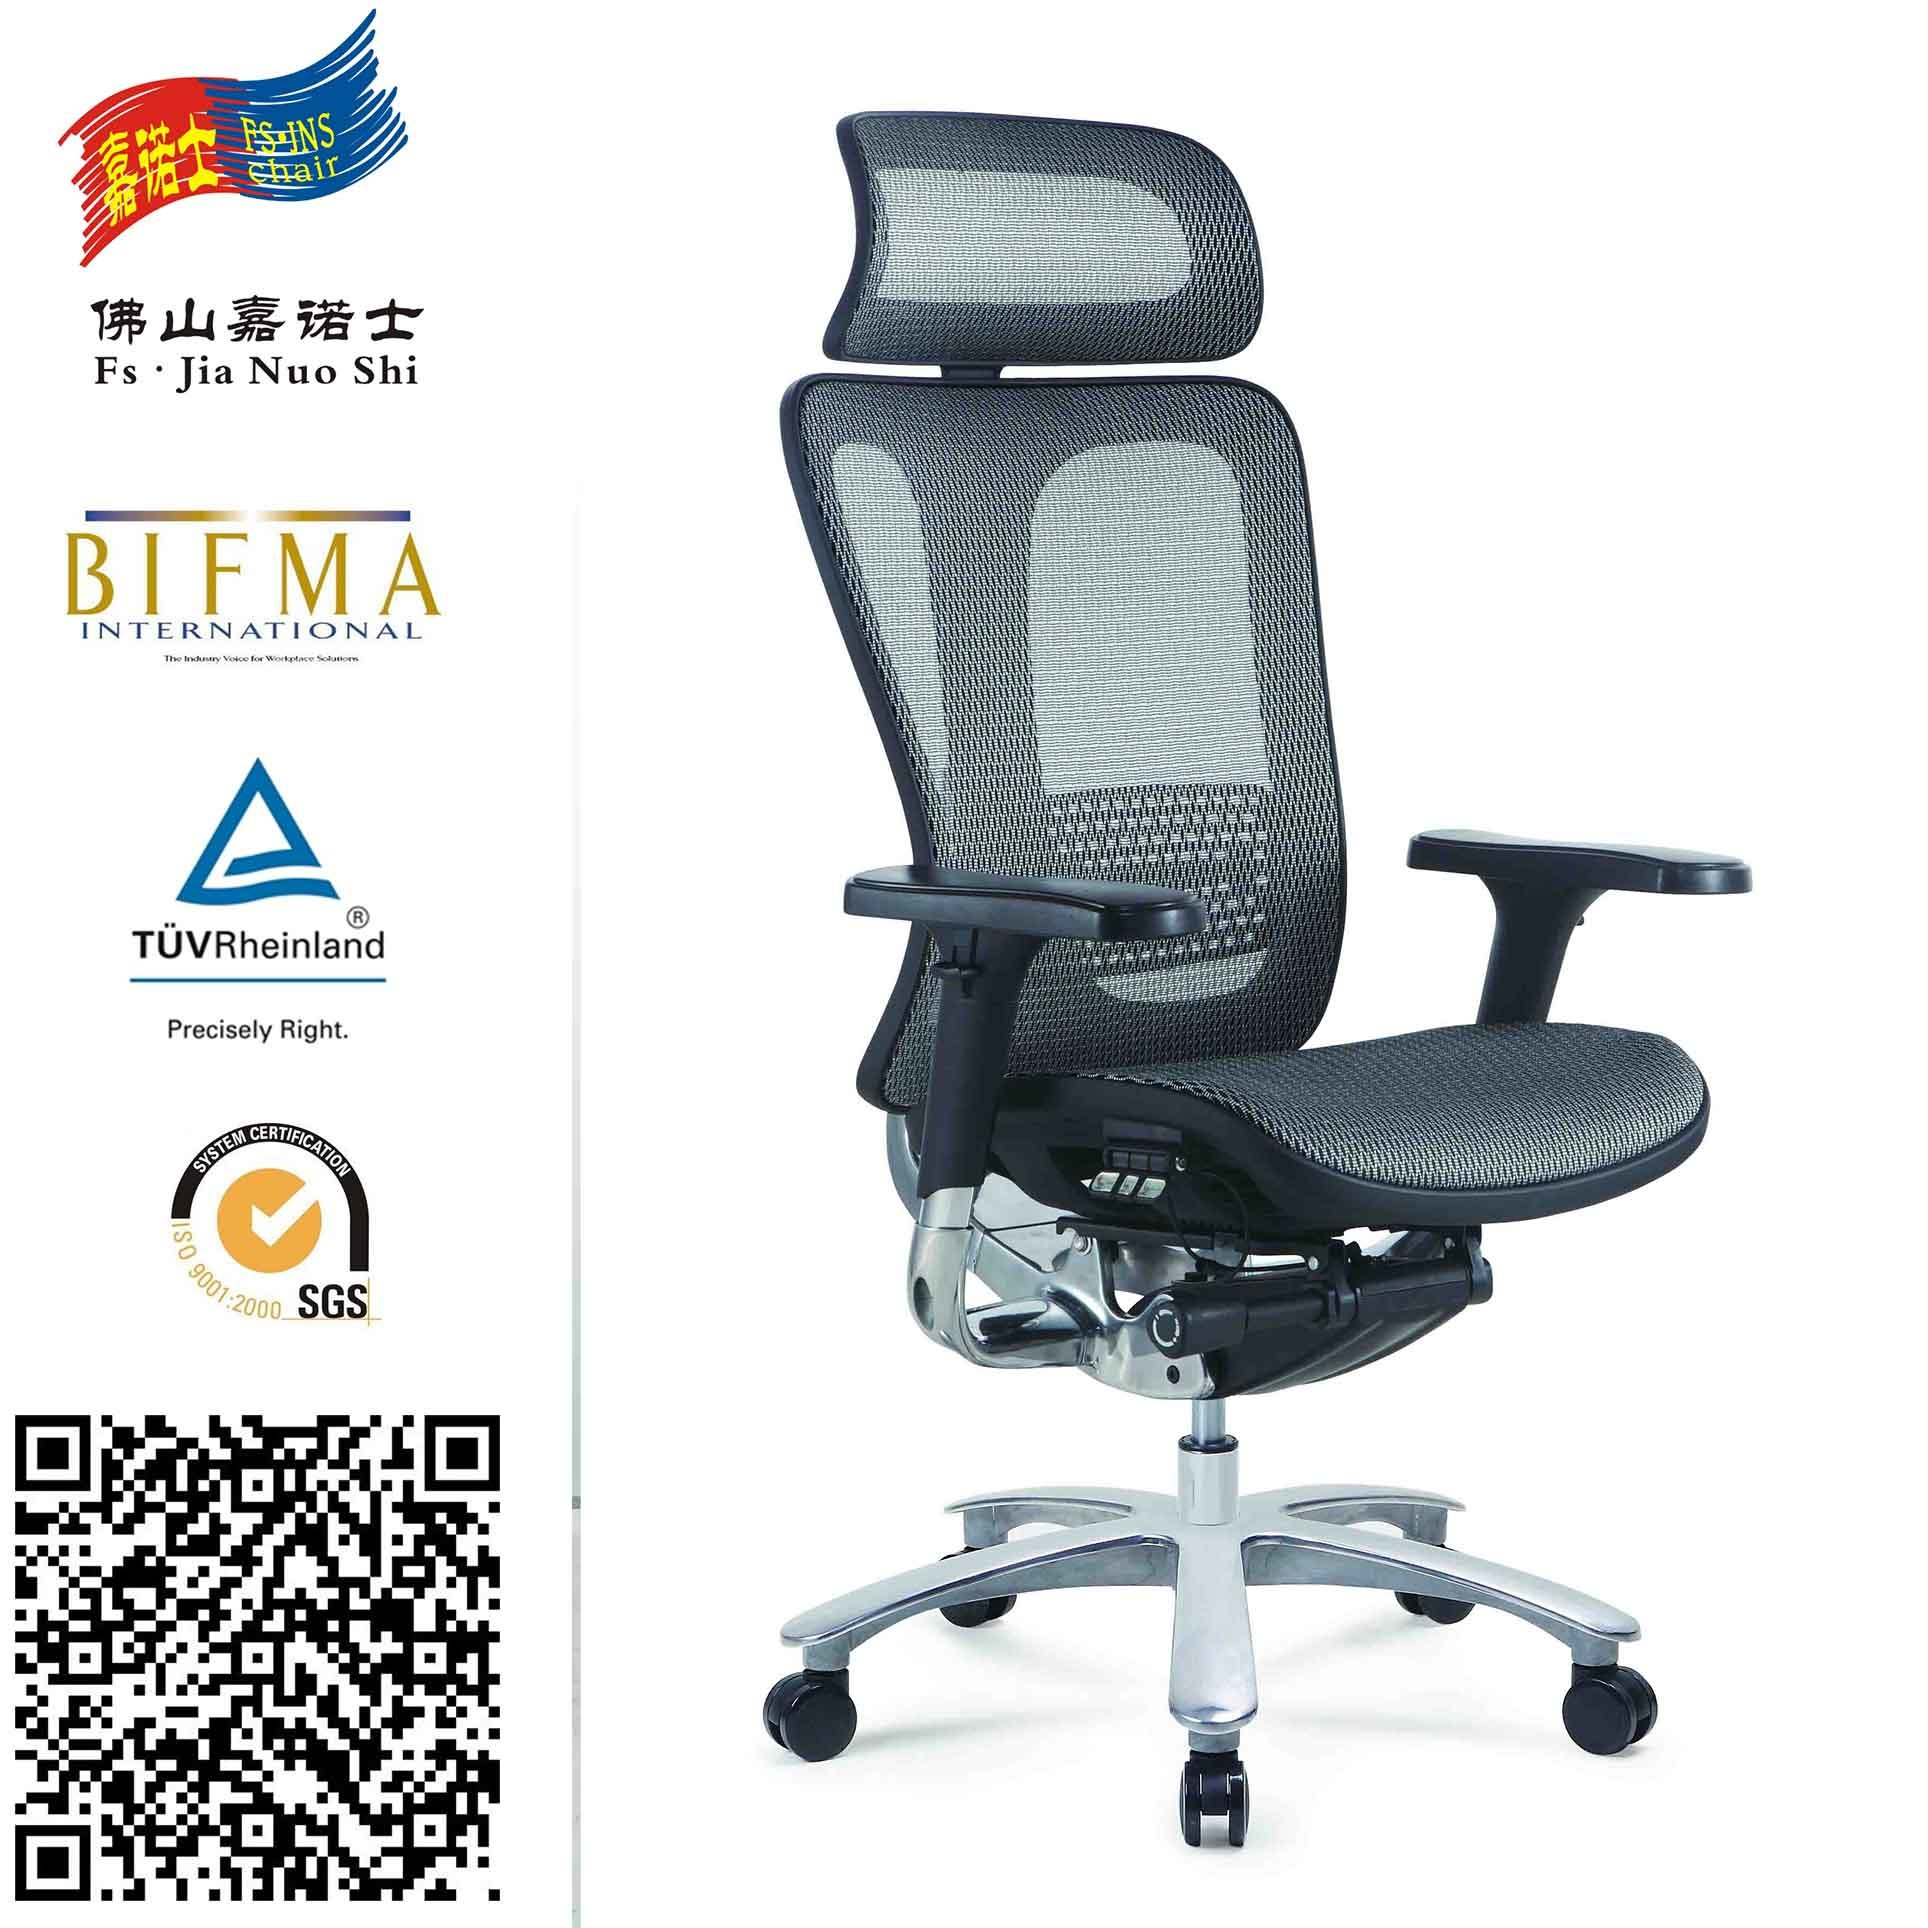 China Jns 5 Years Warranty Adjustable Mesh Dxracer Chair China